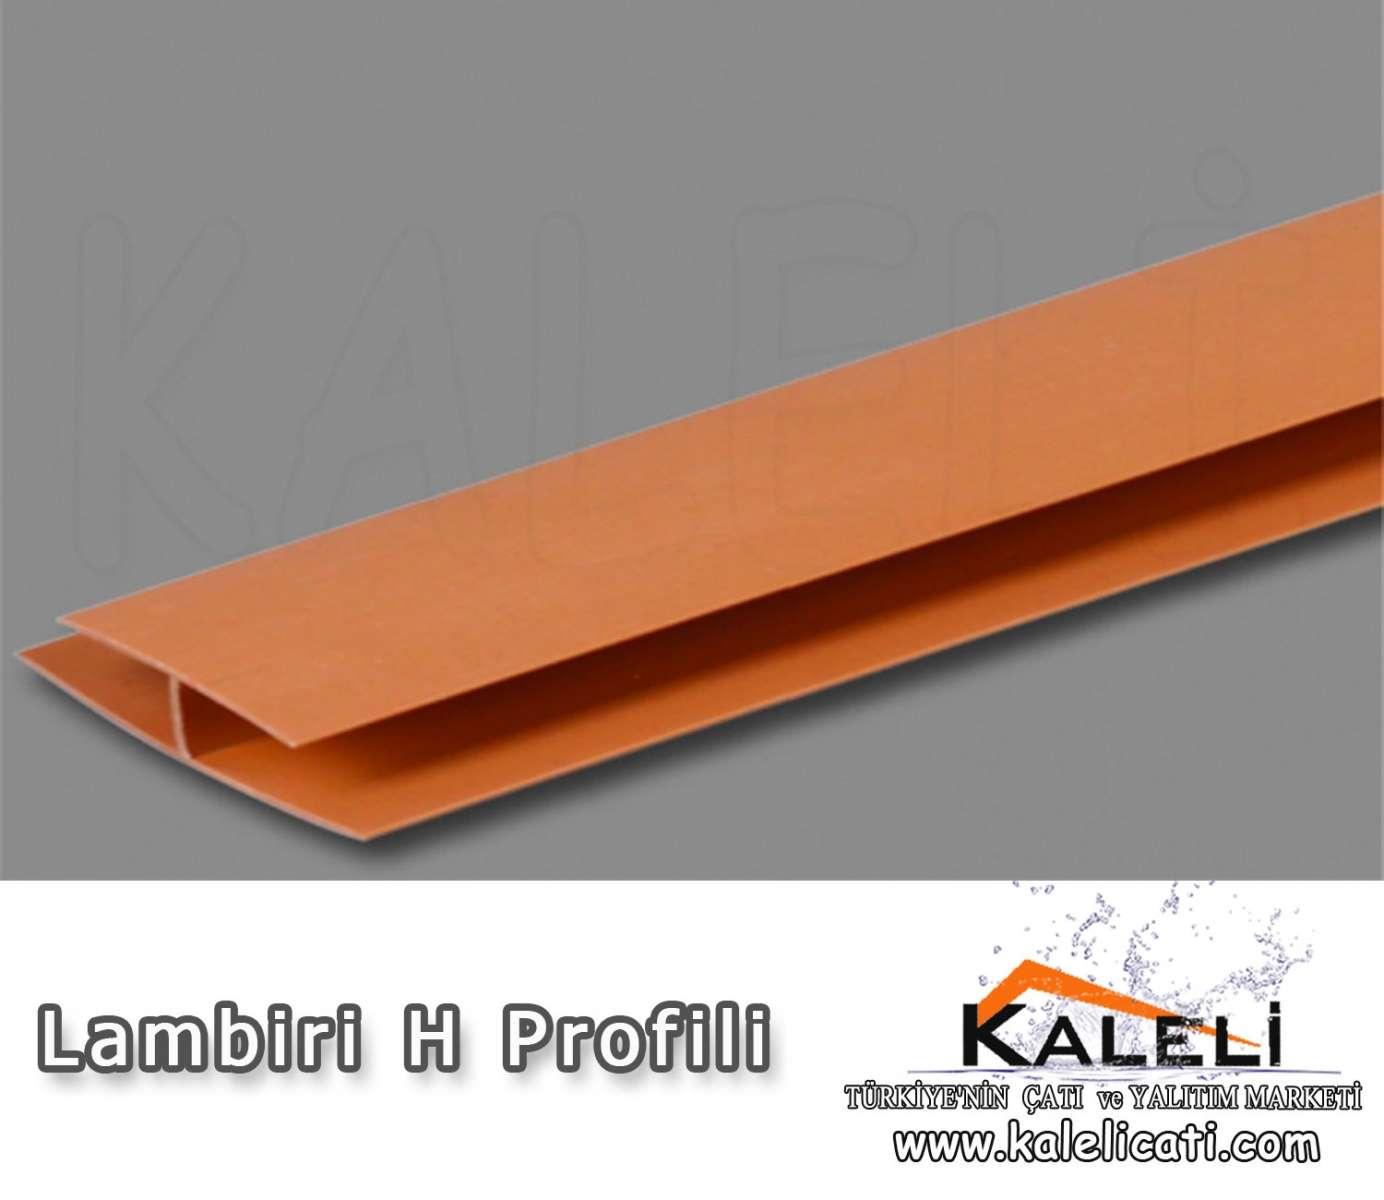 Lambiri H Profili 6m.